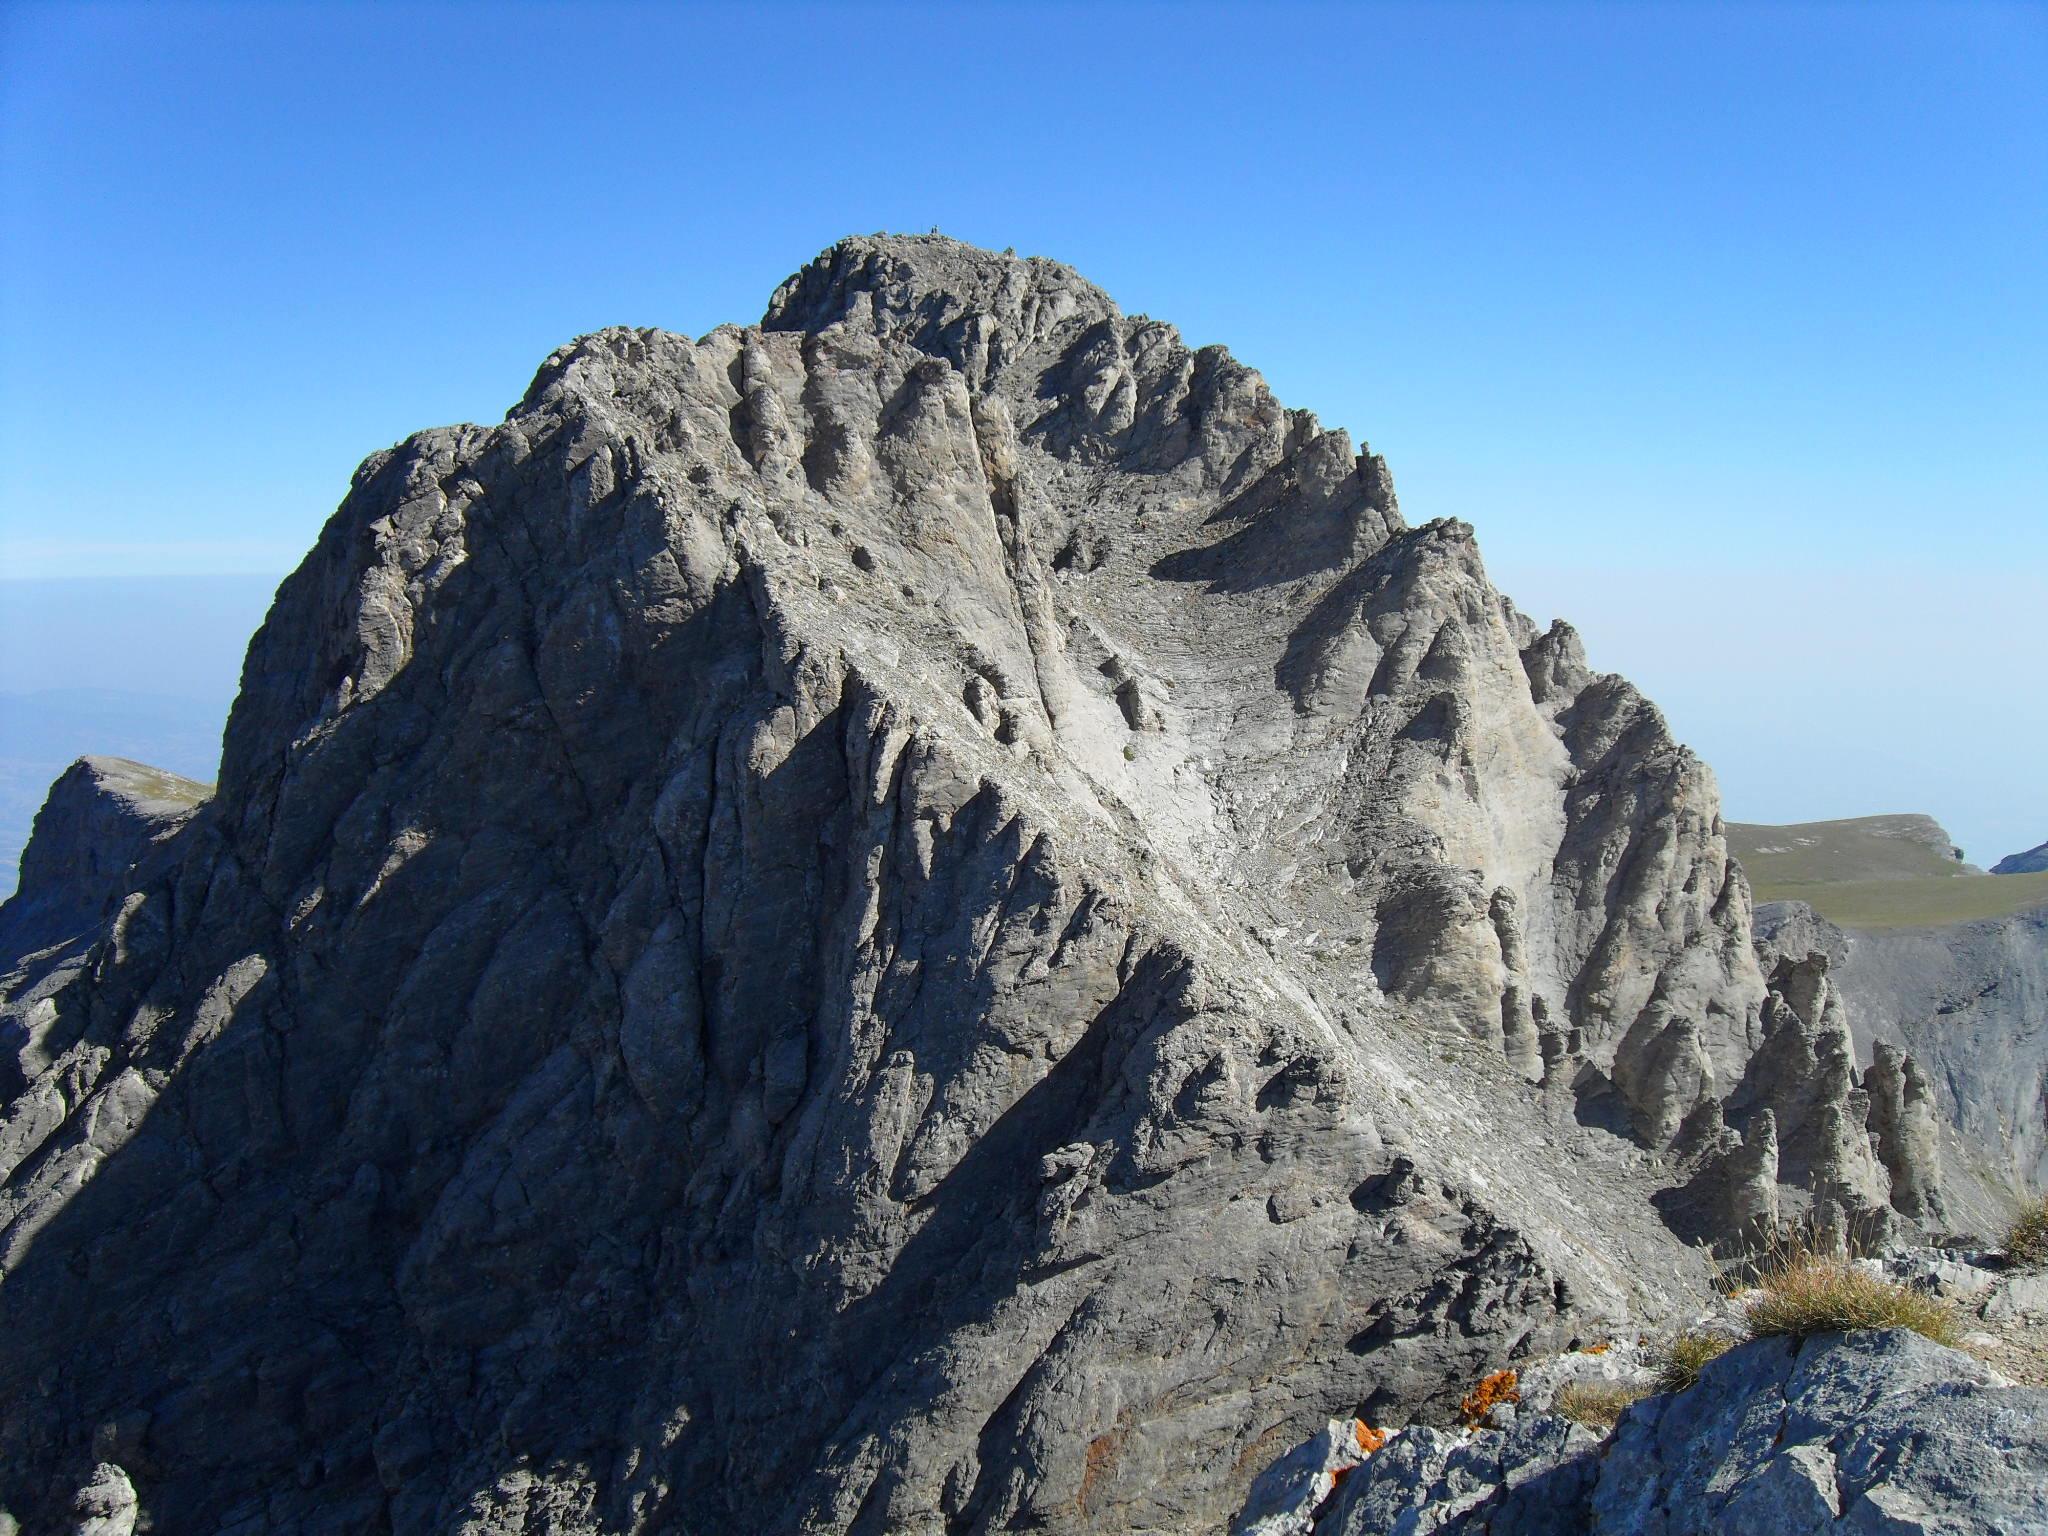 Restplätze noch verfügbar: Der Olymp 2.918 m - Sitz der Götter